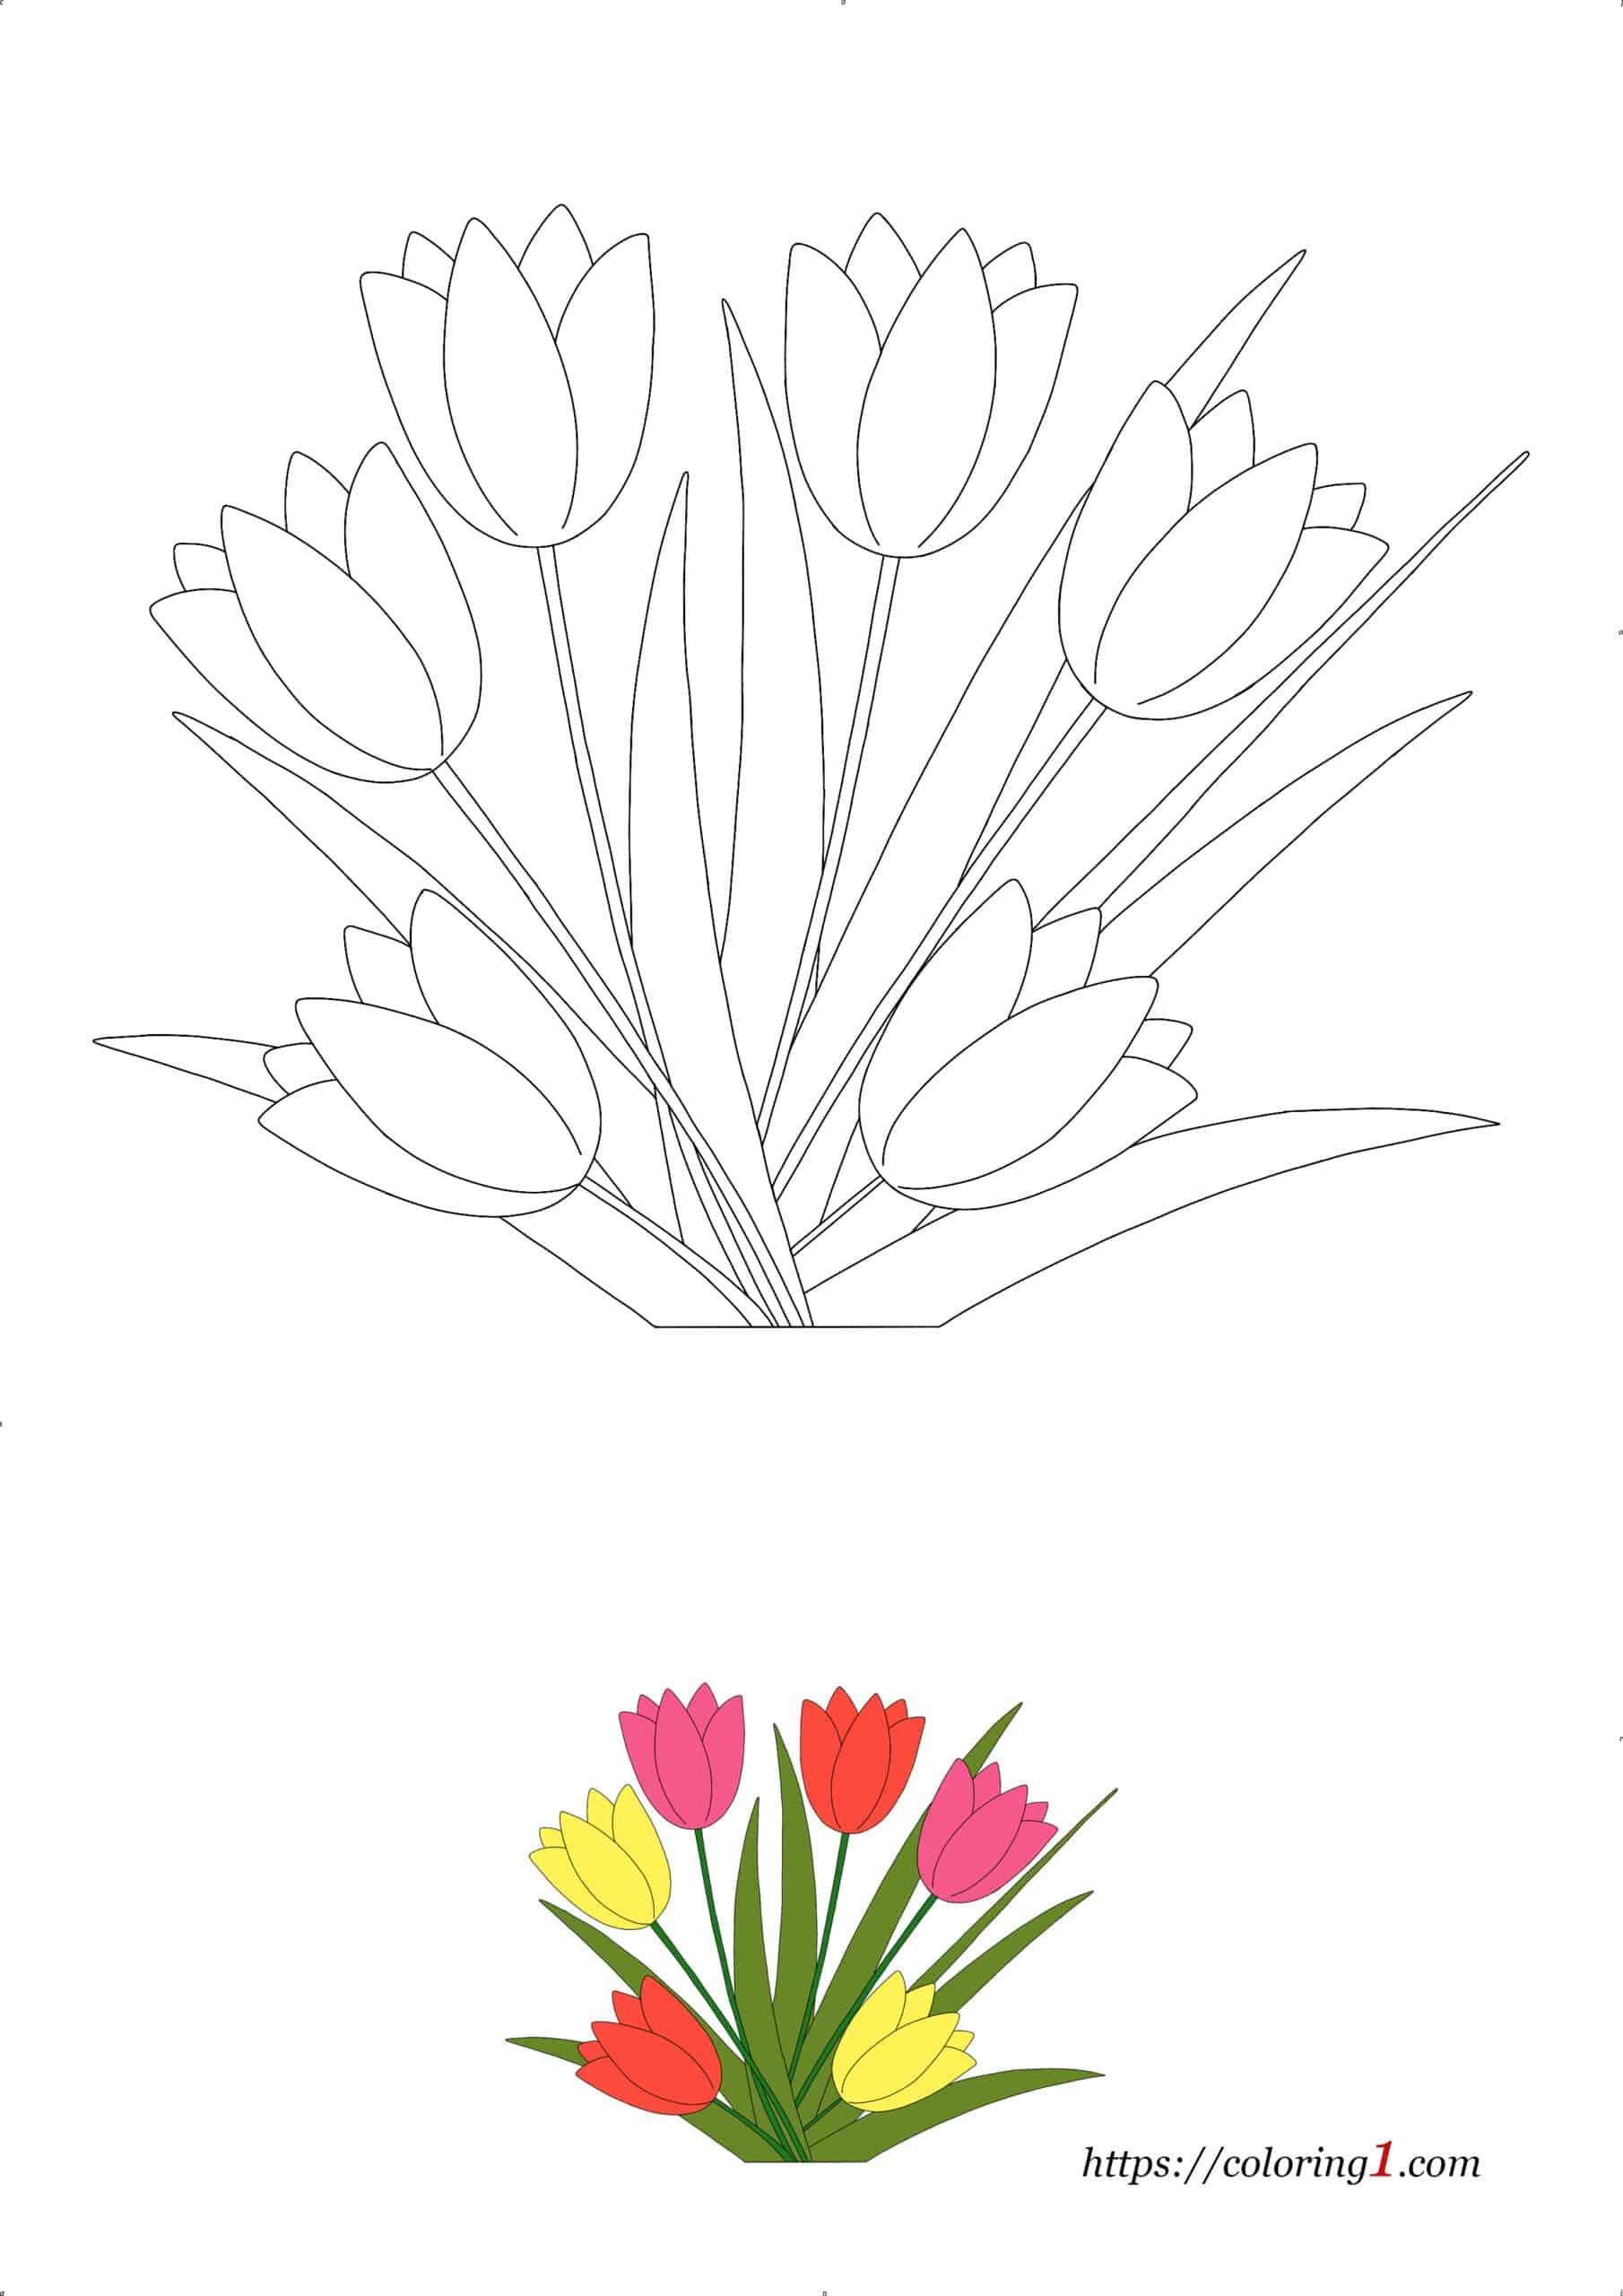 Coloriage dessin Fleur Tulipe à imprimer gratuit